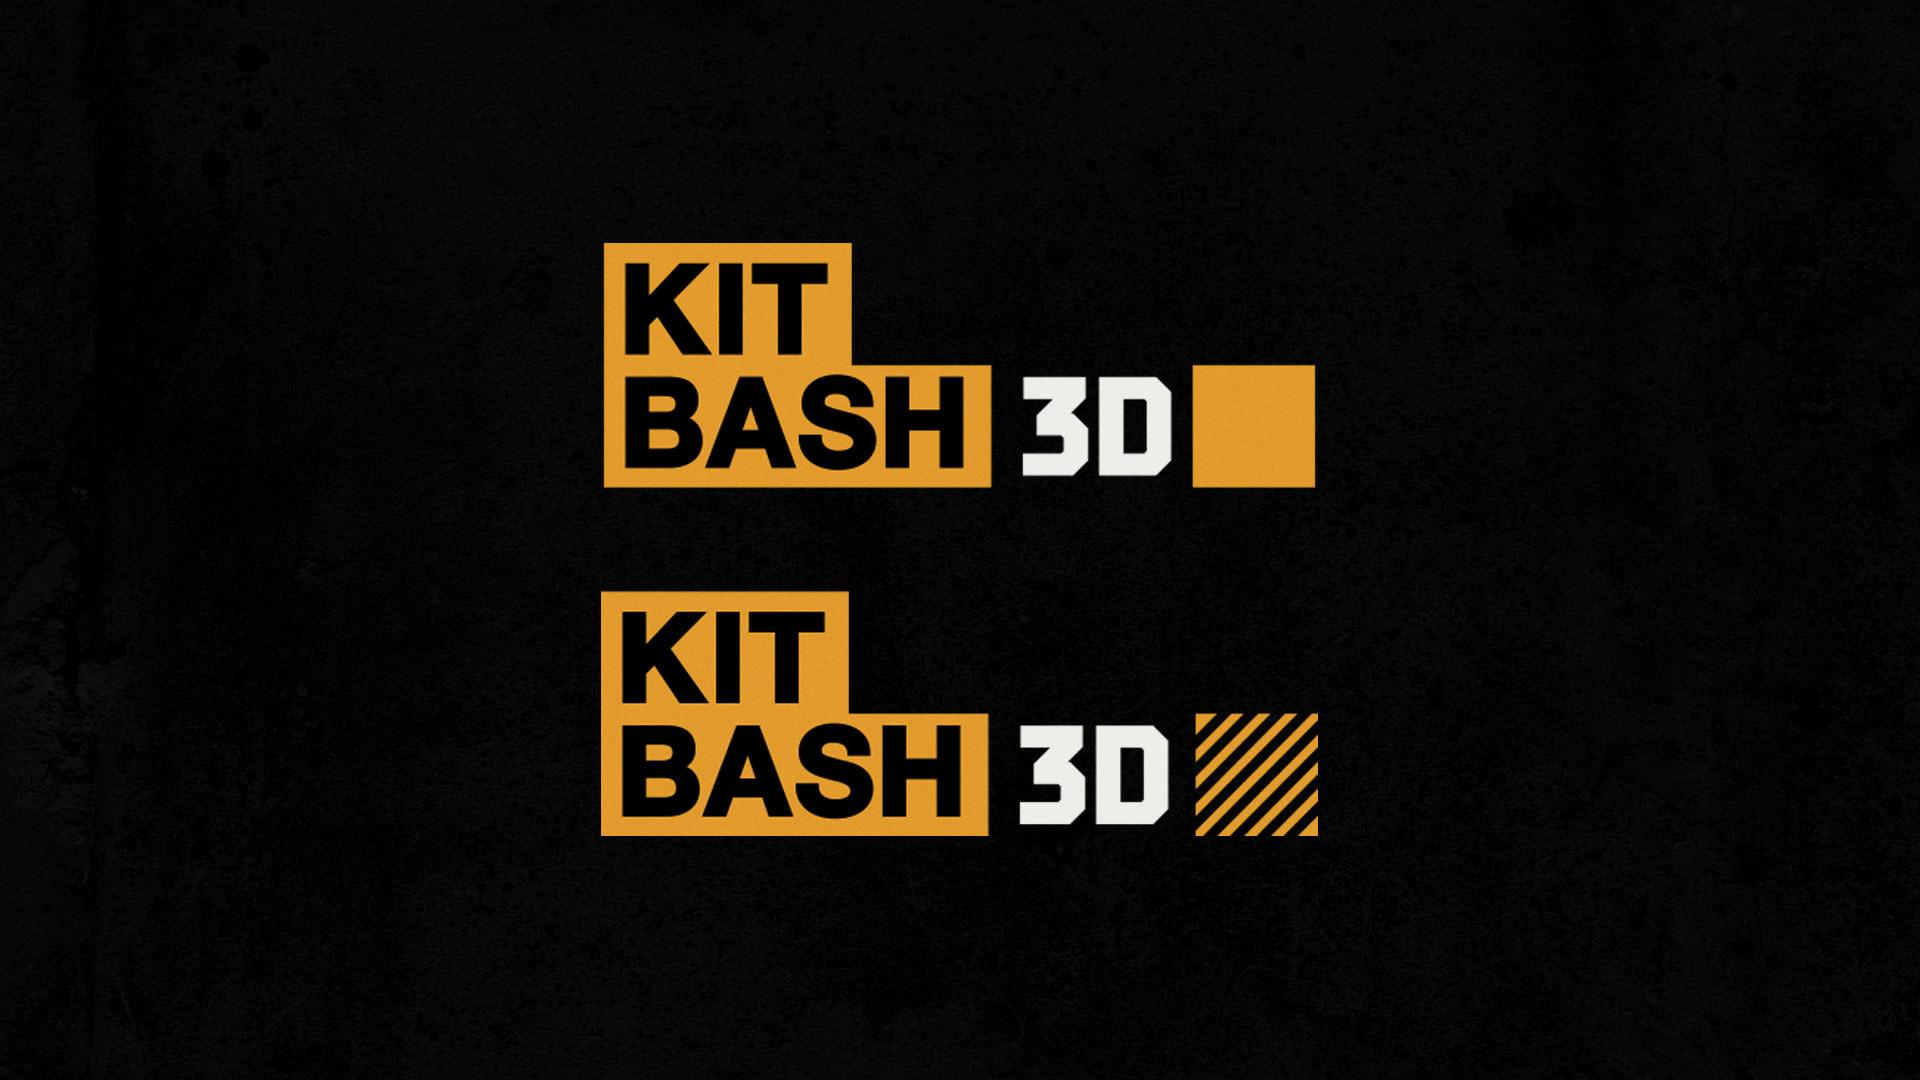 oscar mar - KITBASH 3D